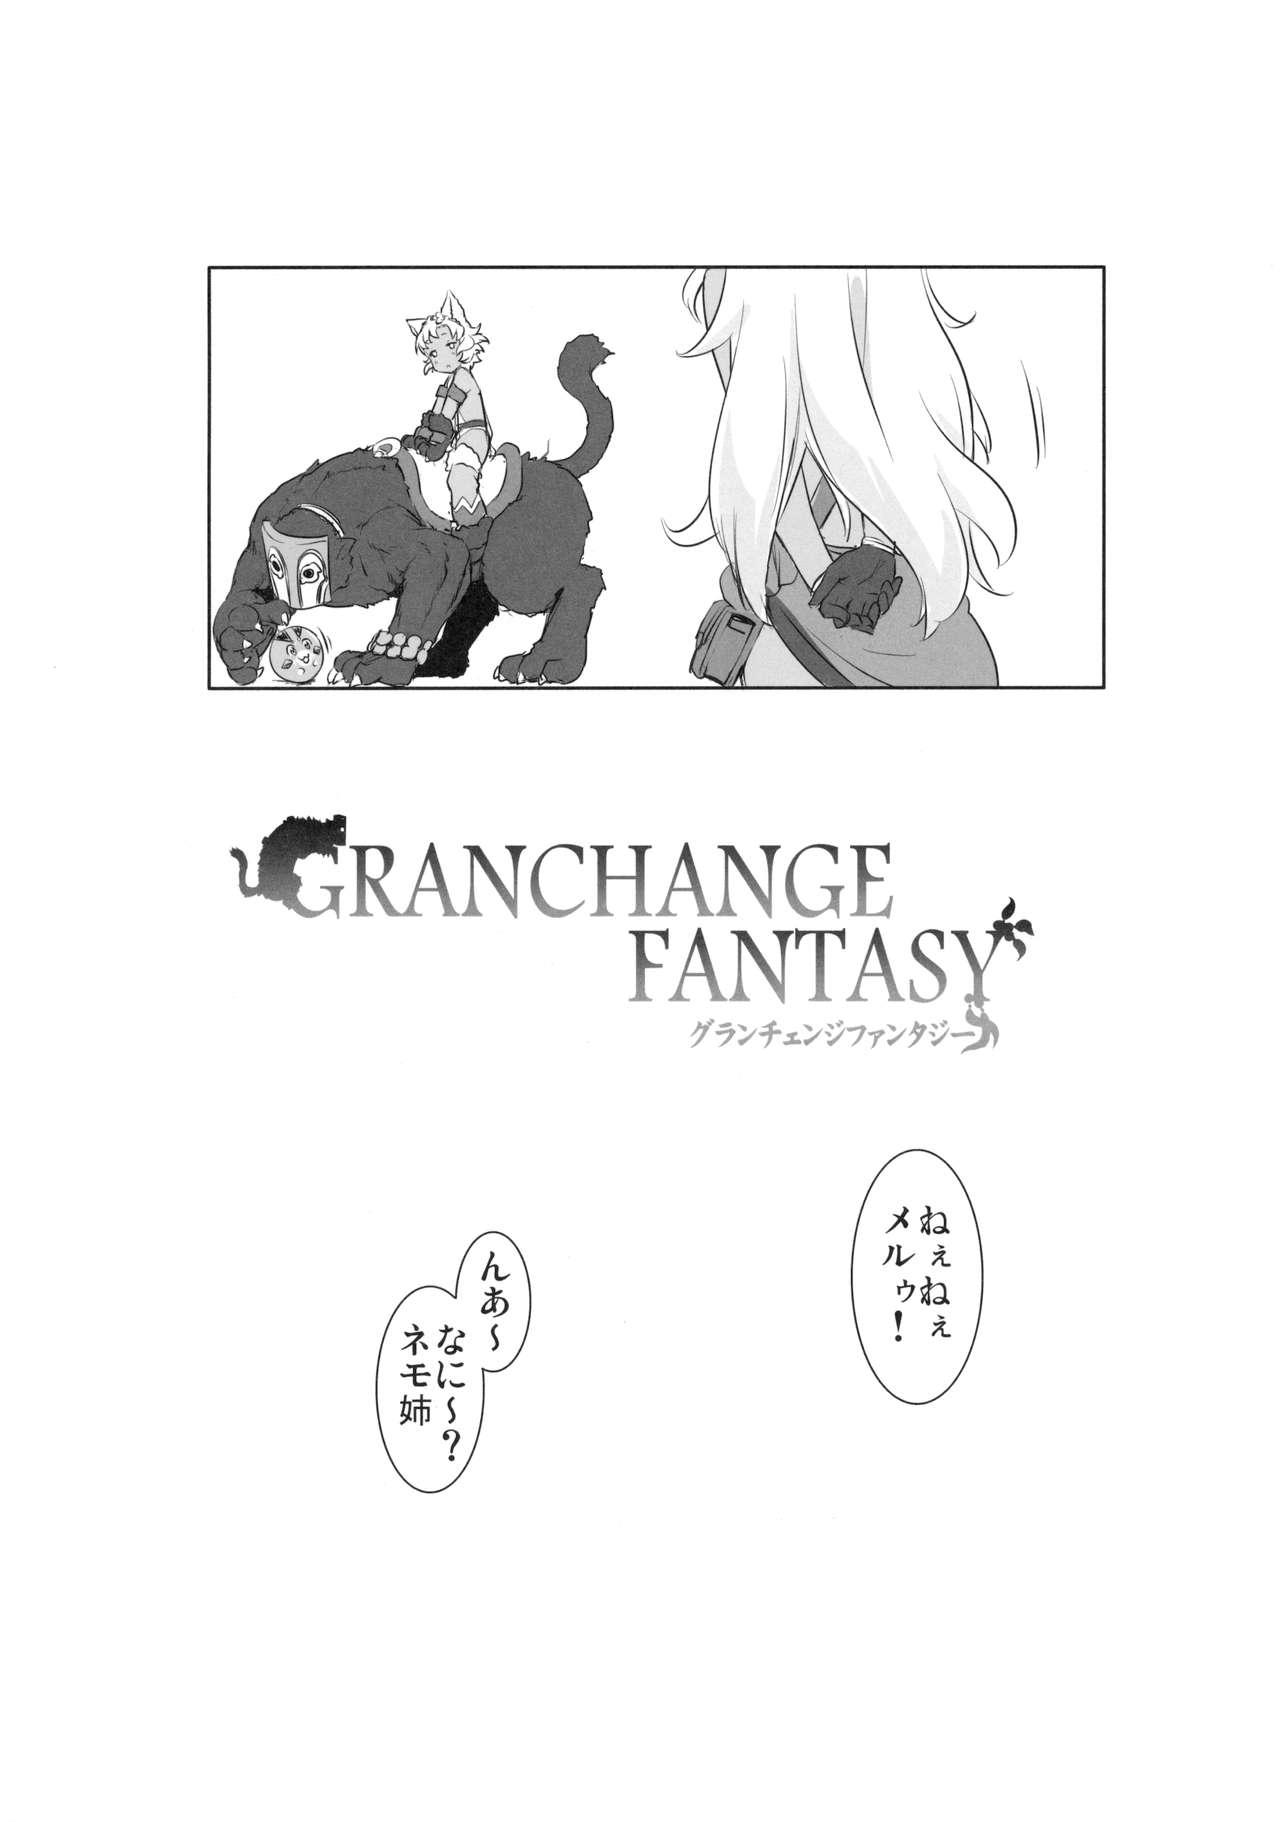 GRANCHANGE FANTASY 2